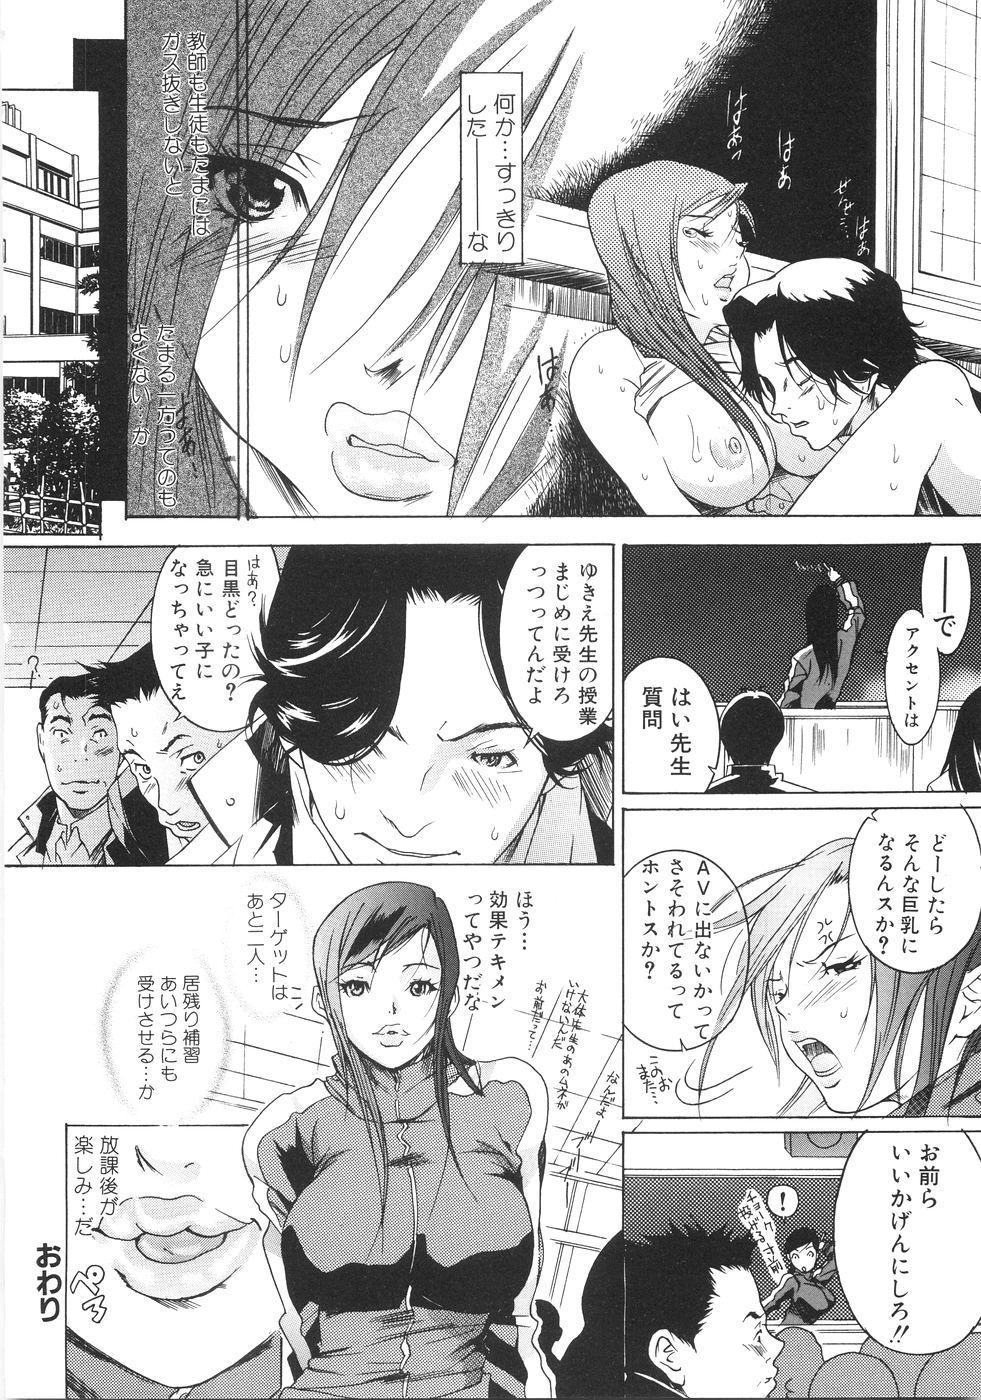 Honki Jiru - Cowper's Gland Liquid? or Love Juice?...?! 14